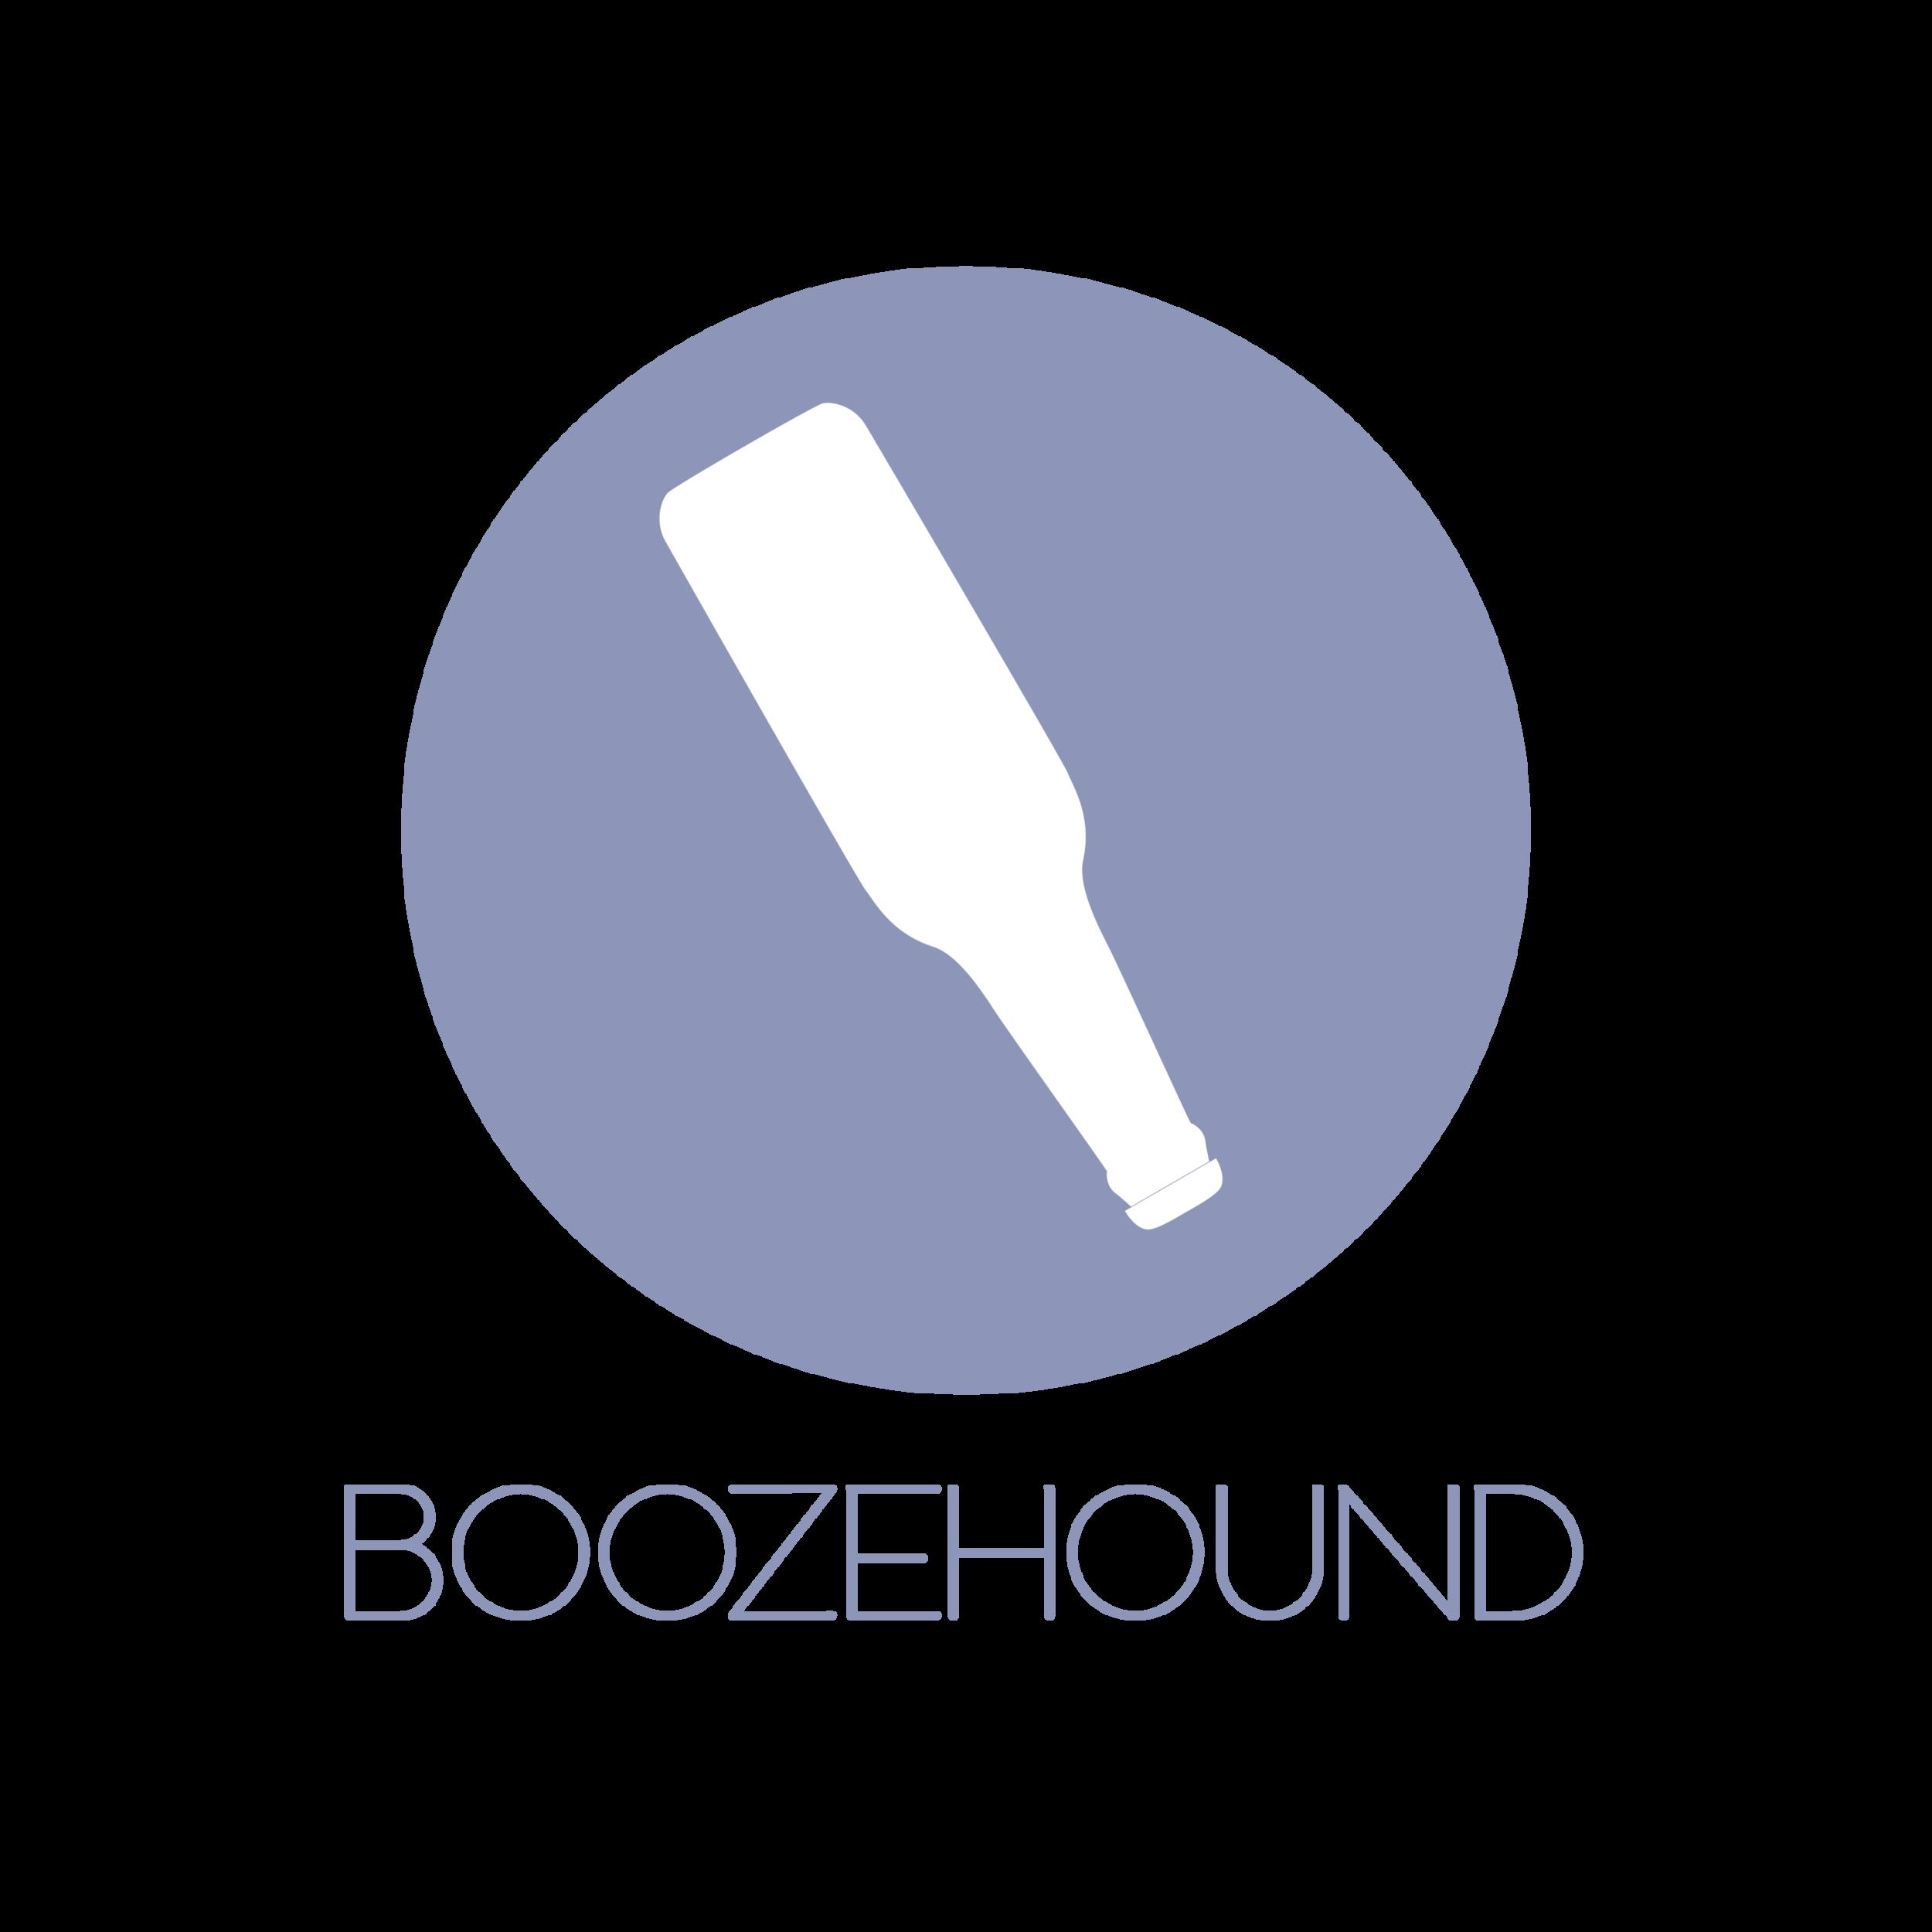 logo_boozehound.png